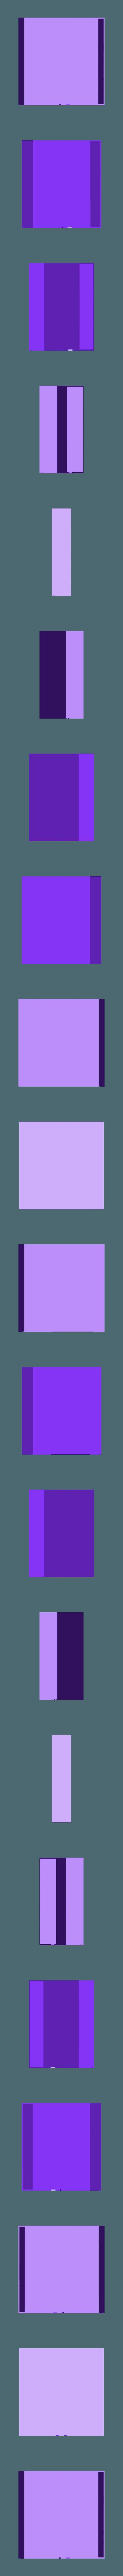 Cajon vacio.stl Download STL file Modular desktop organizer • 3D printing design, LnZProd